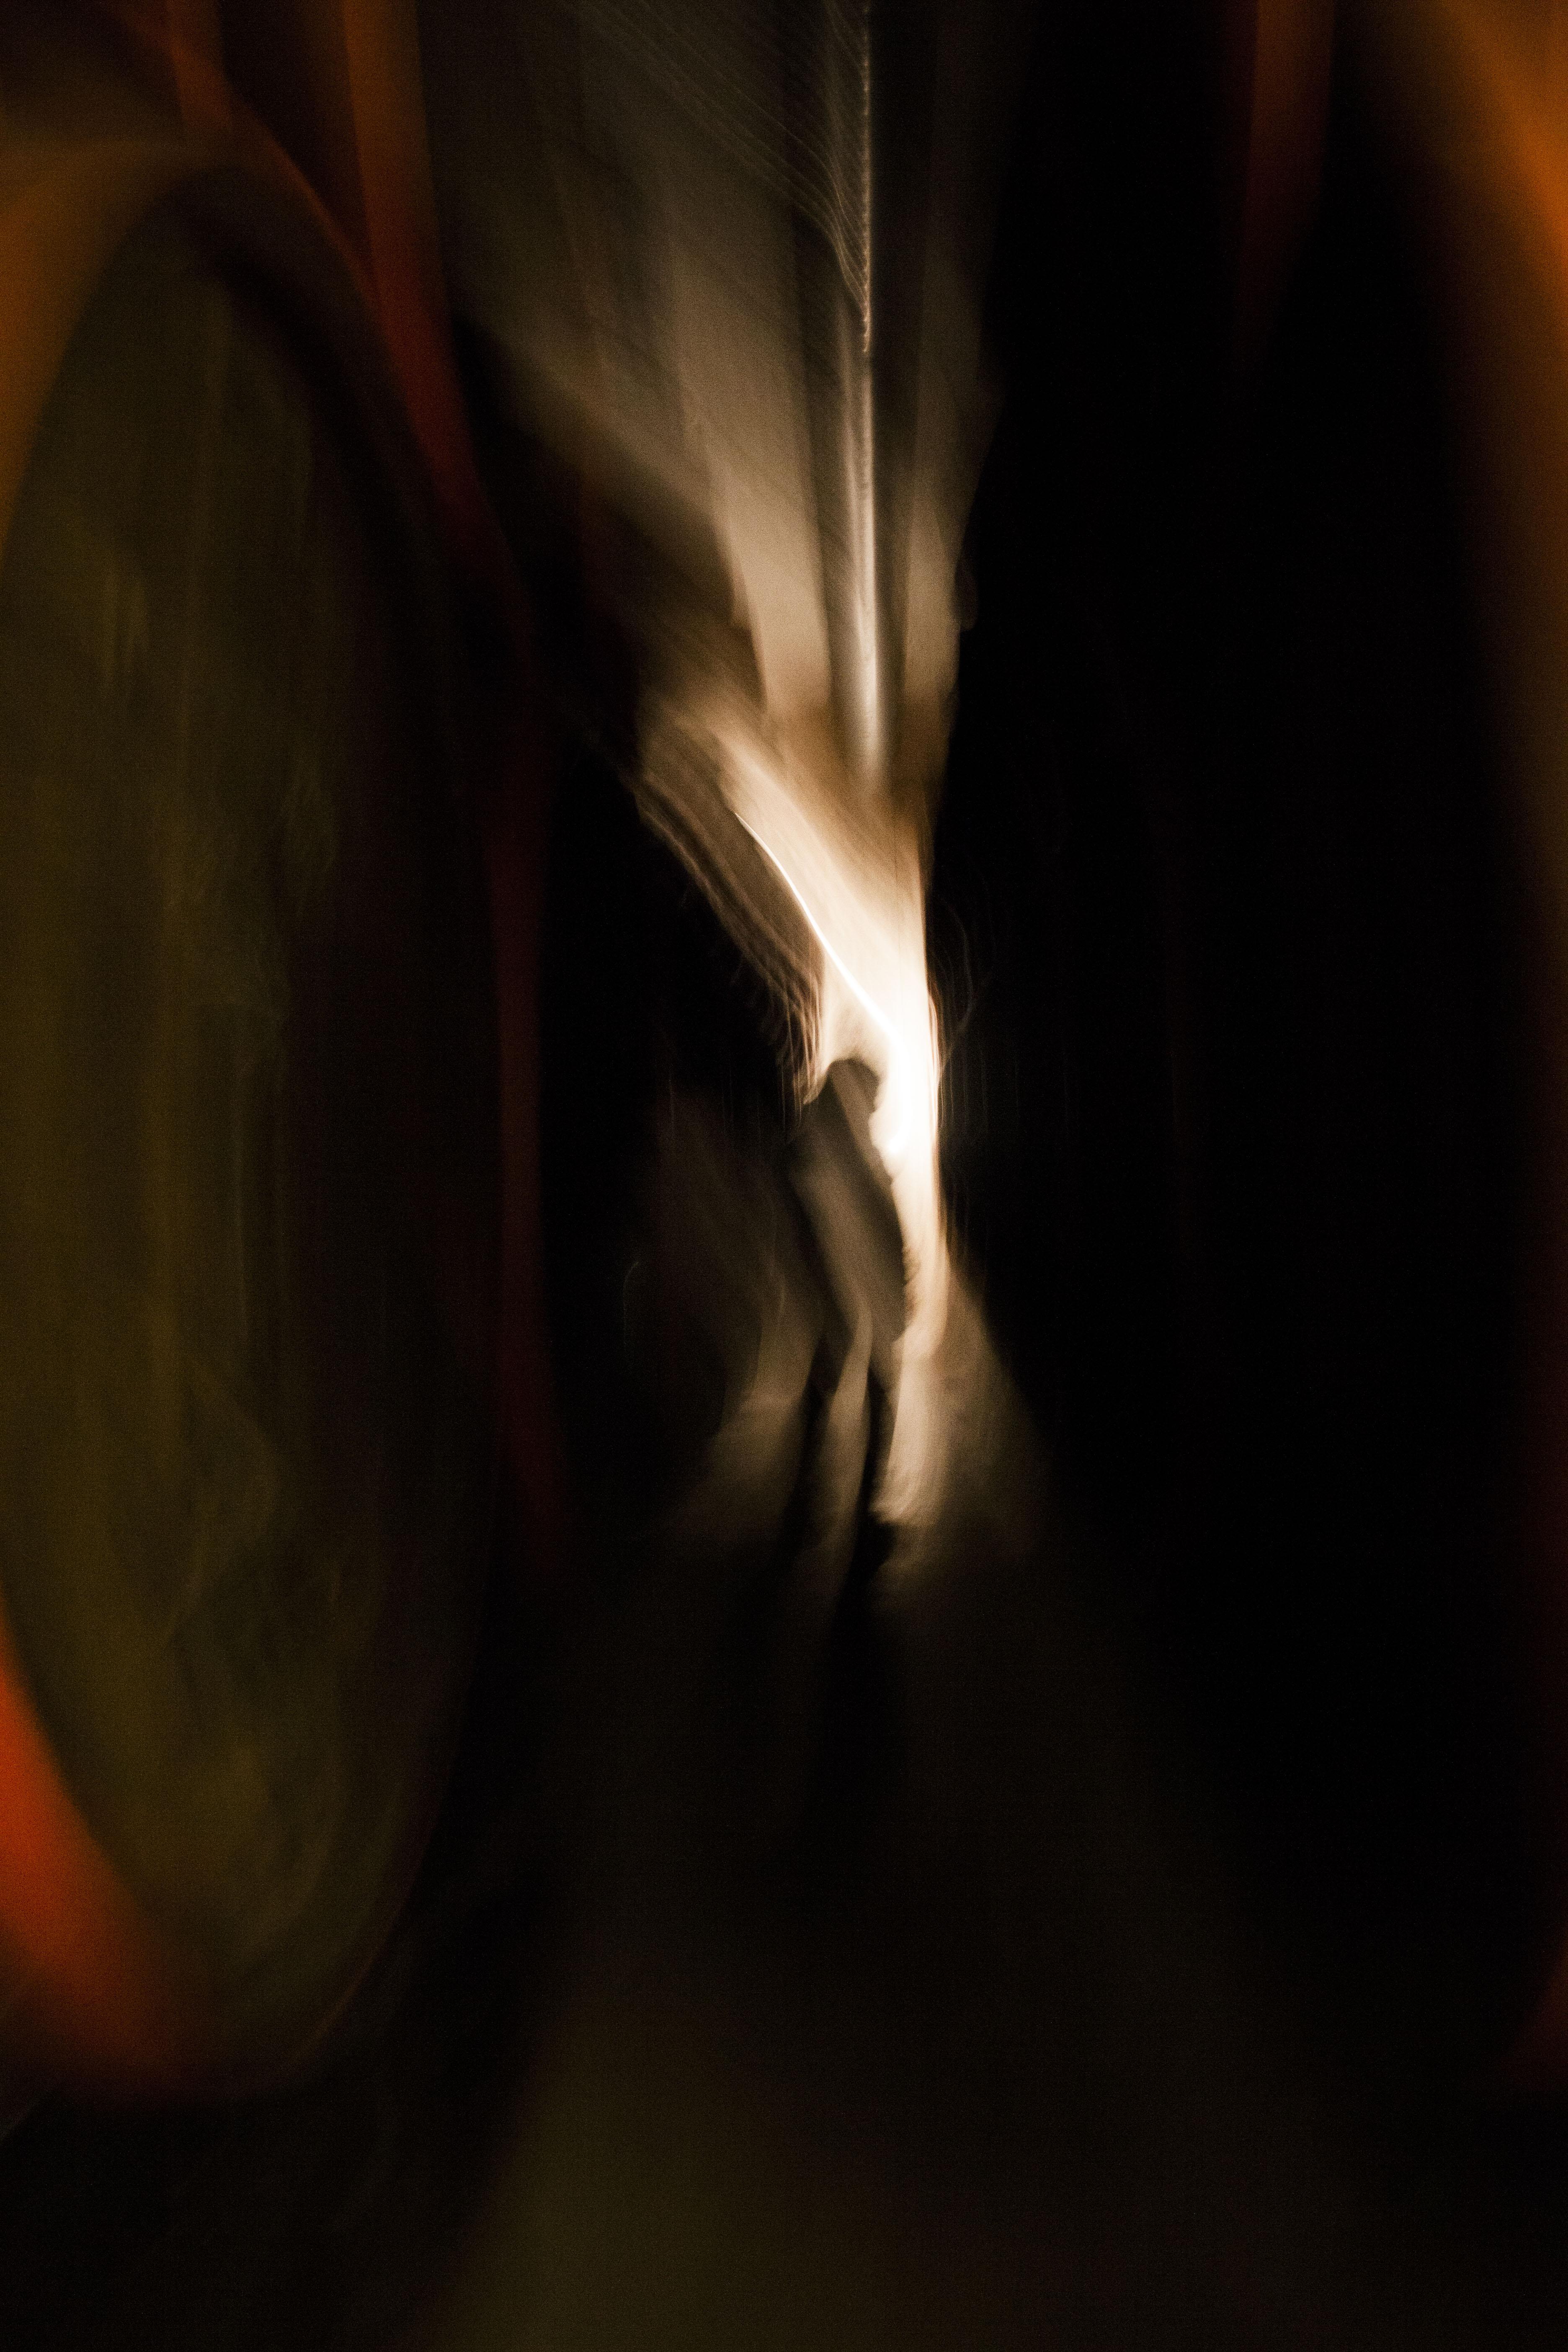 Carlsberg_underground_HelenaLundquist_mindre_5